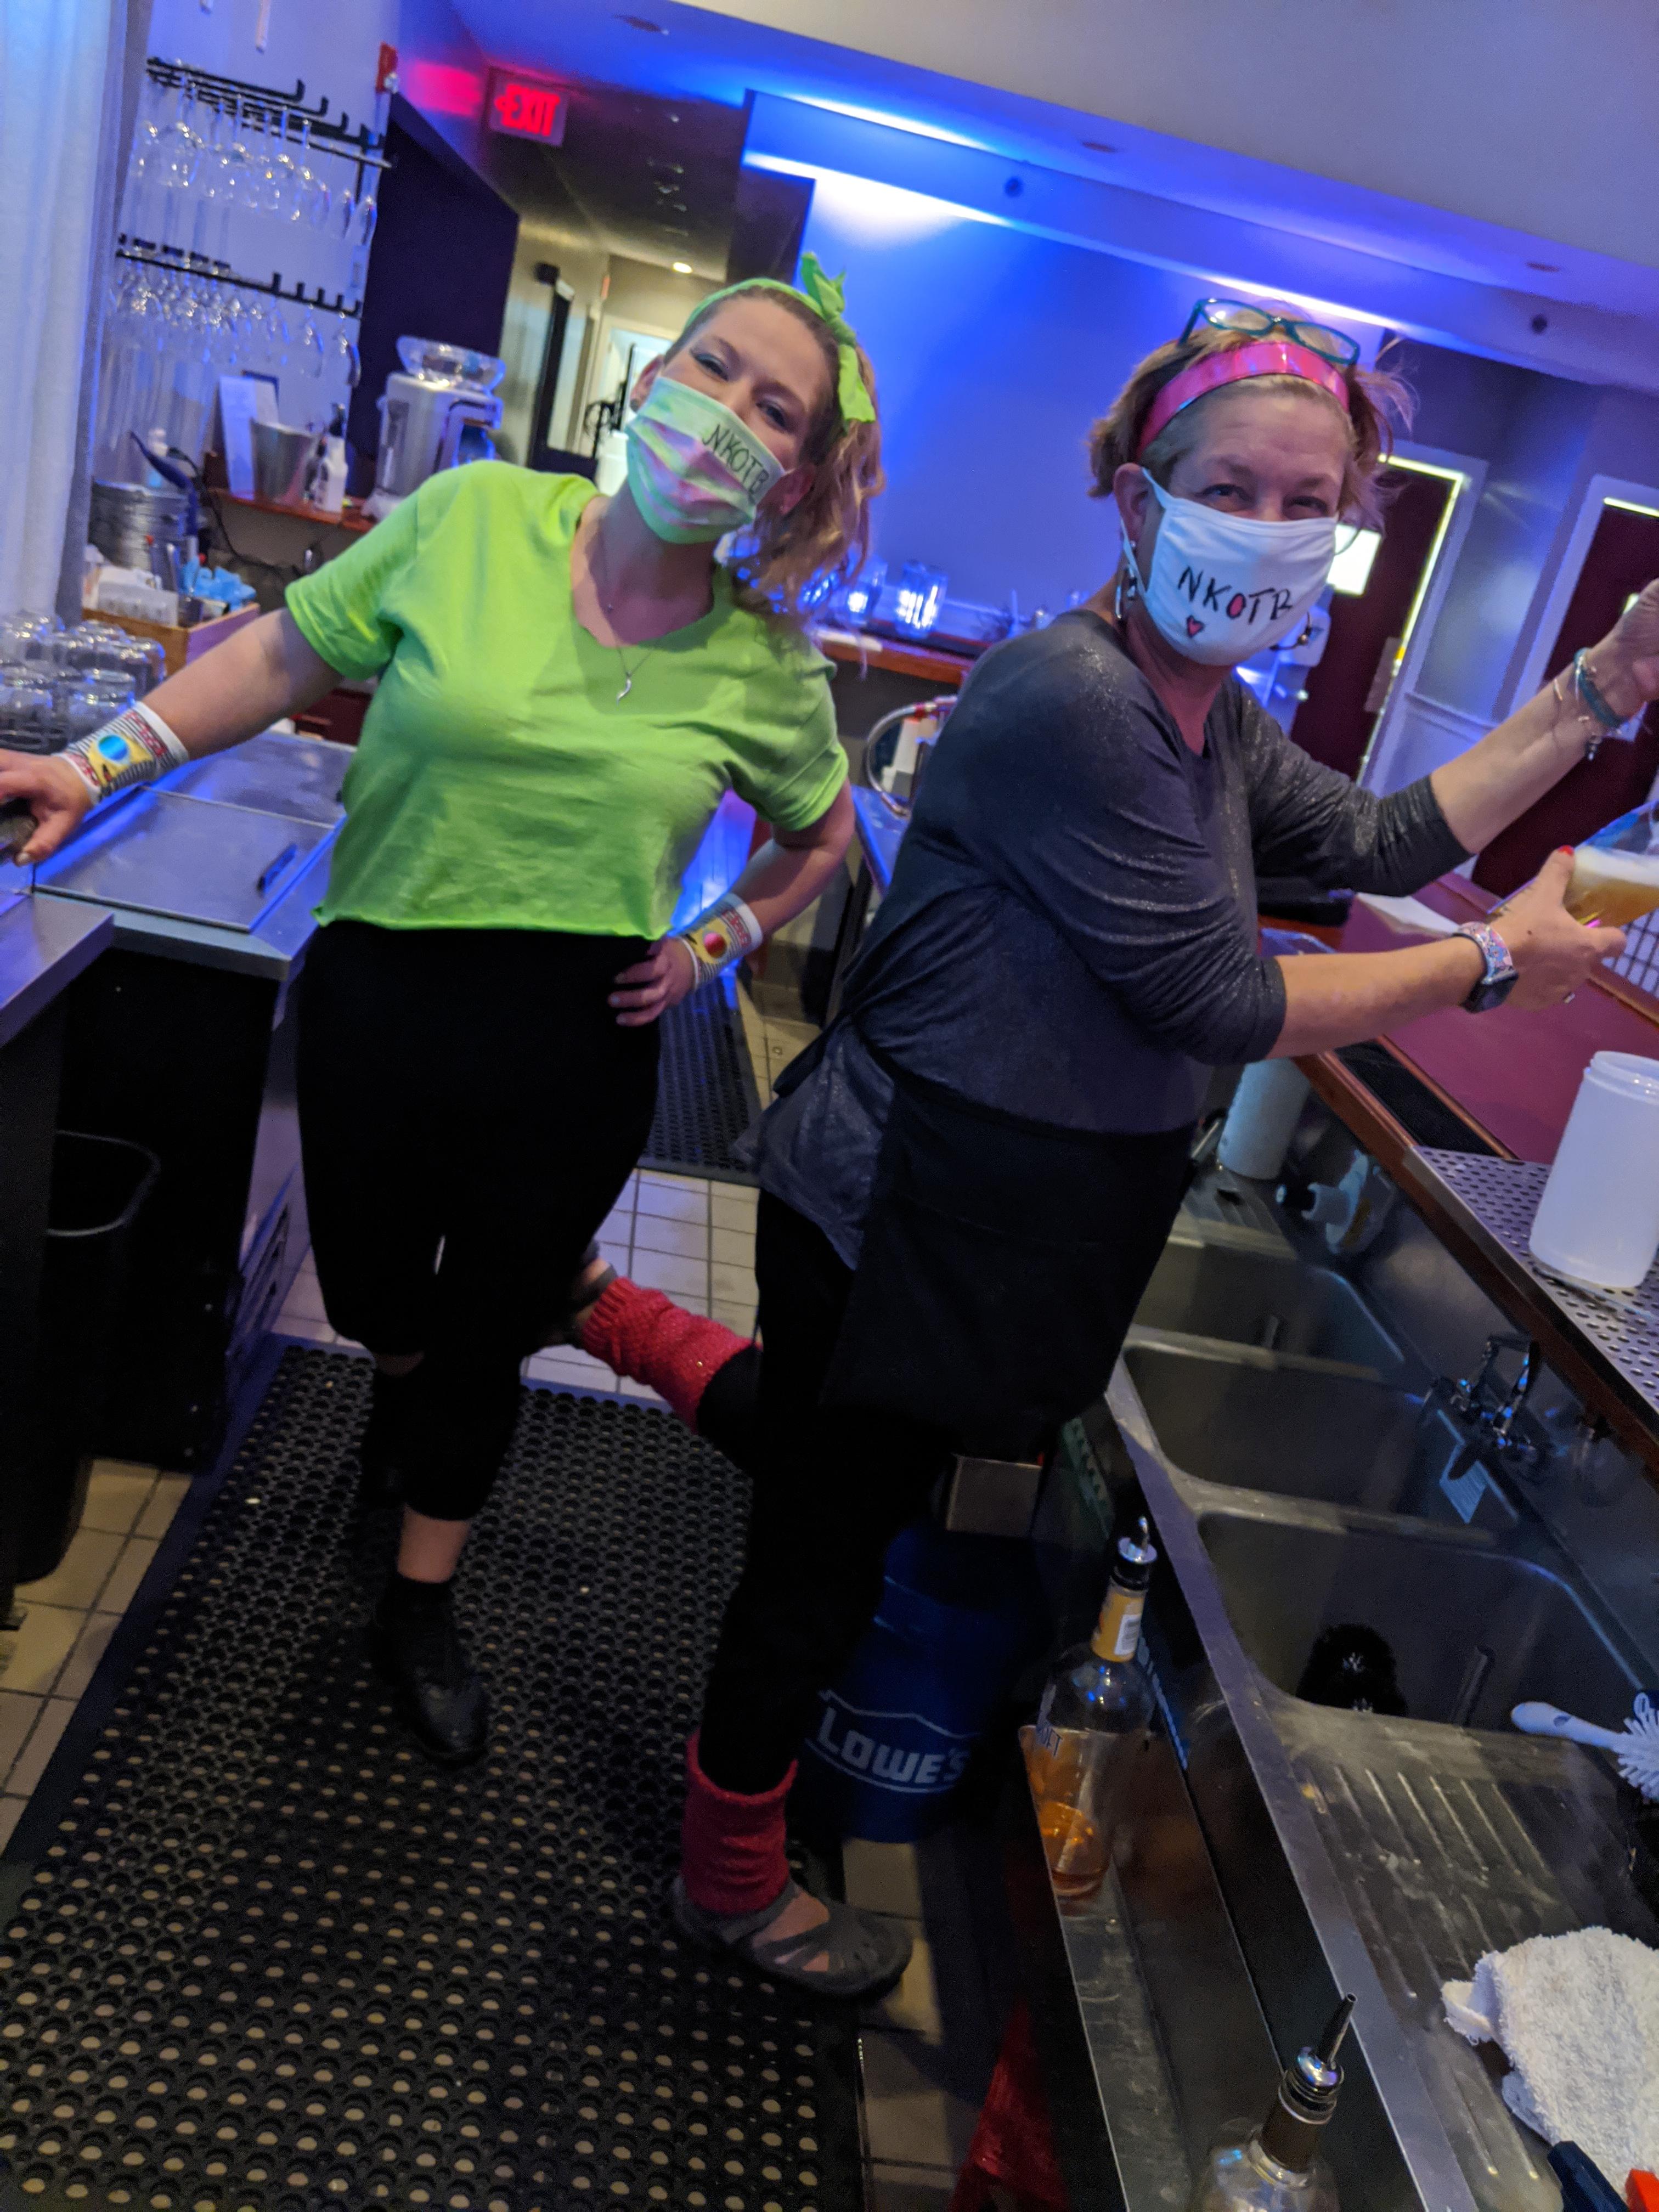 Servers Gone Wild